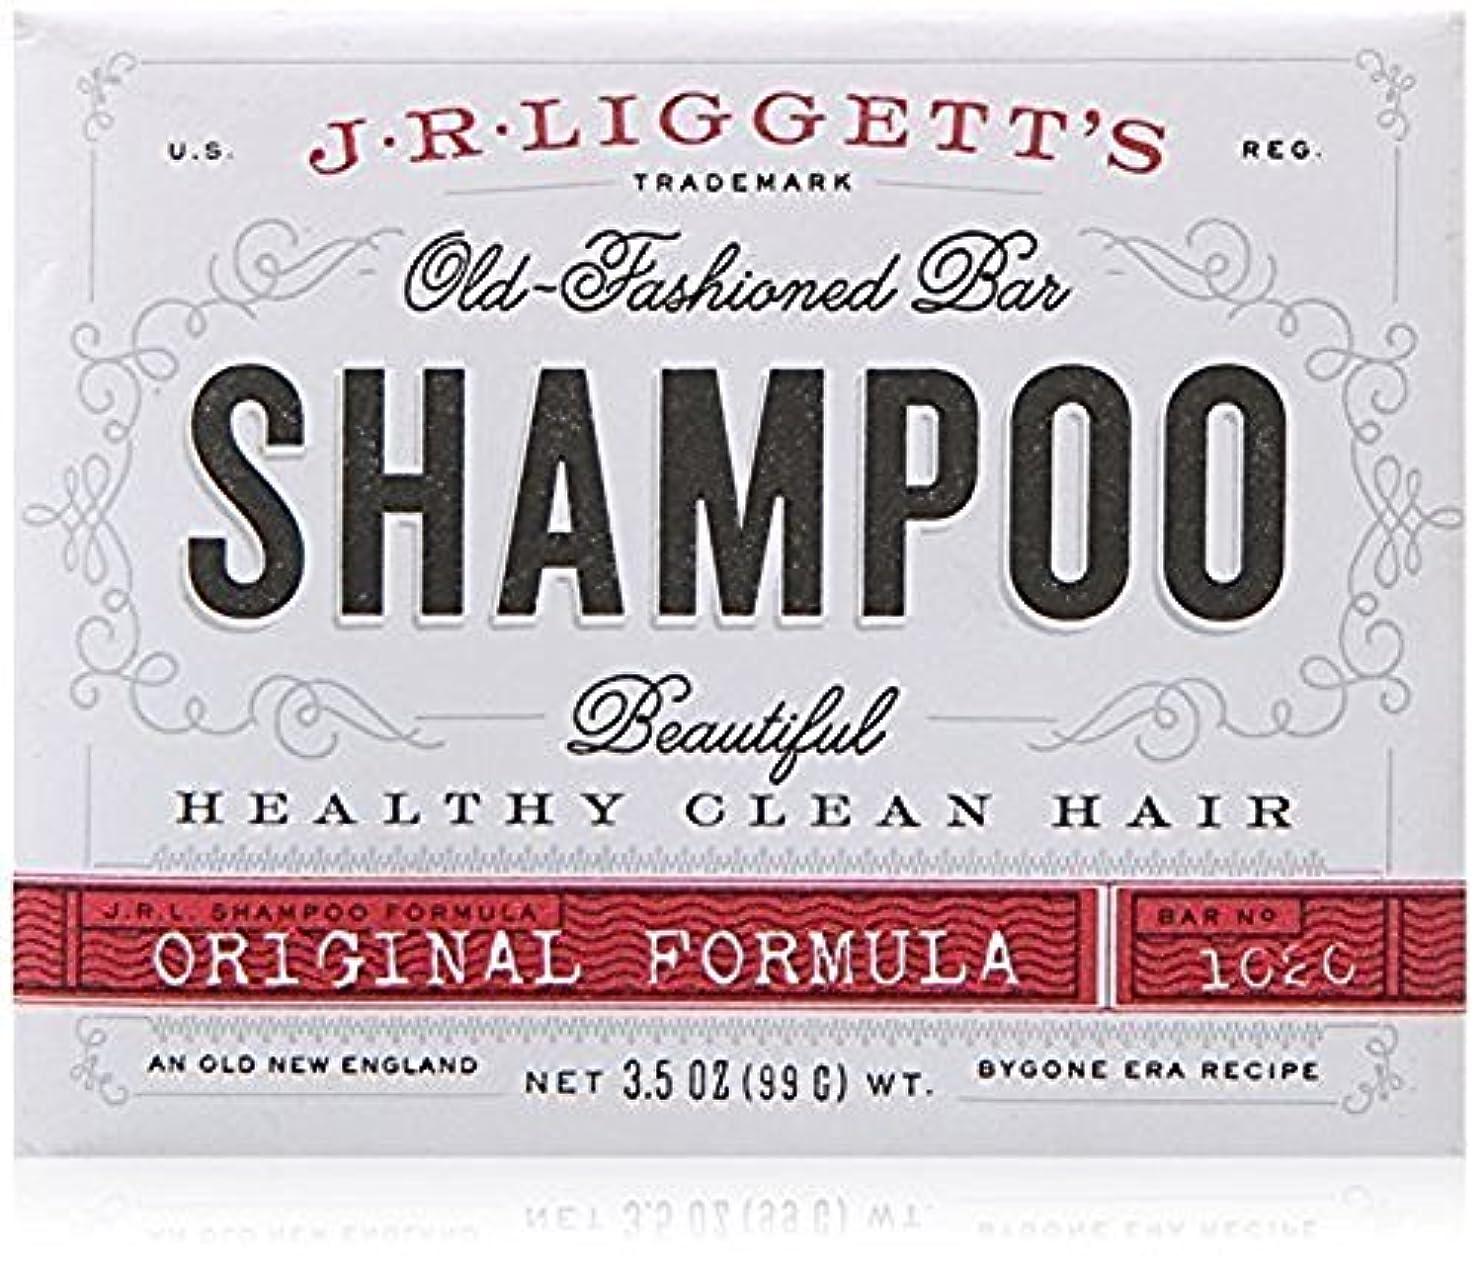 x J.R.Liggett's Old-Fashioned Bar Shampoo The Original Formula - 3.5 oz by J.R. Liggett